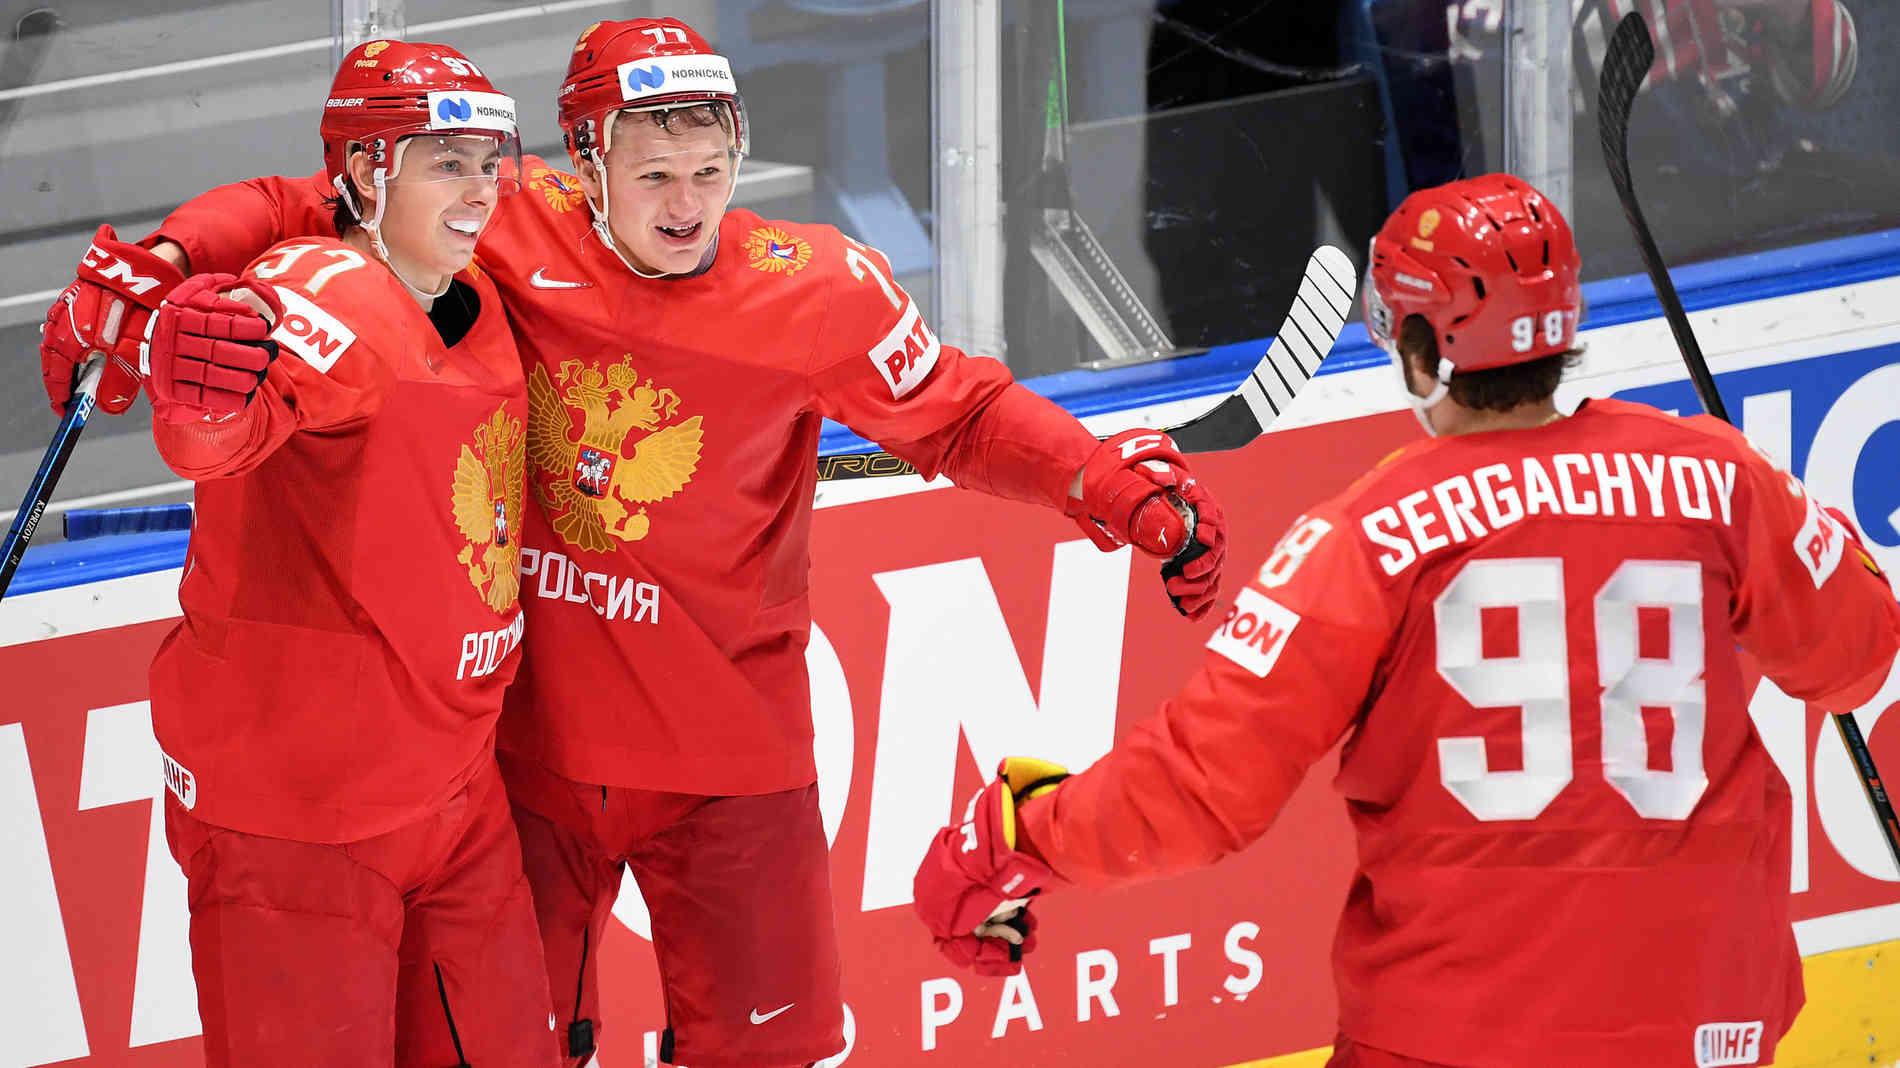 Russland agypten sportwetten 24